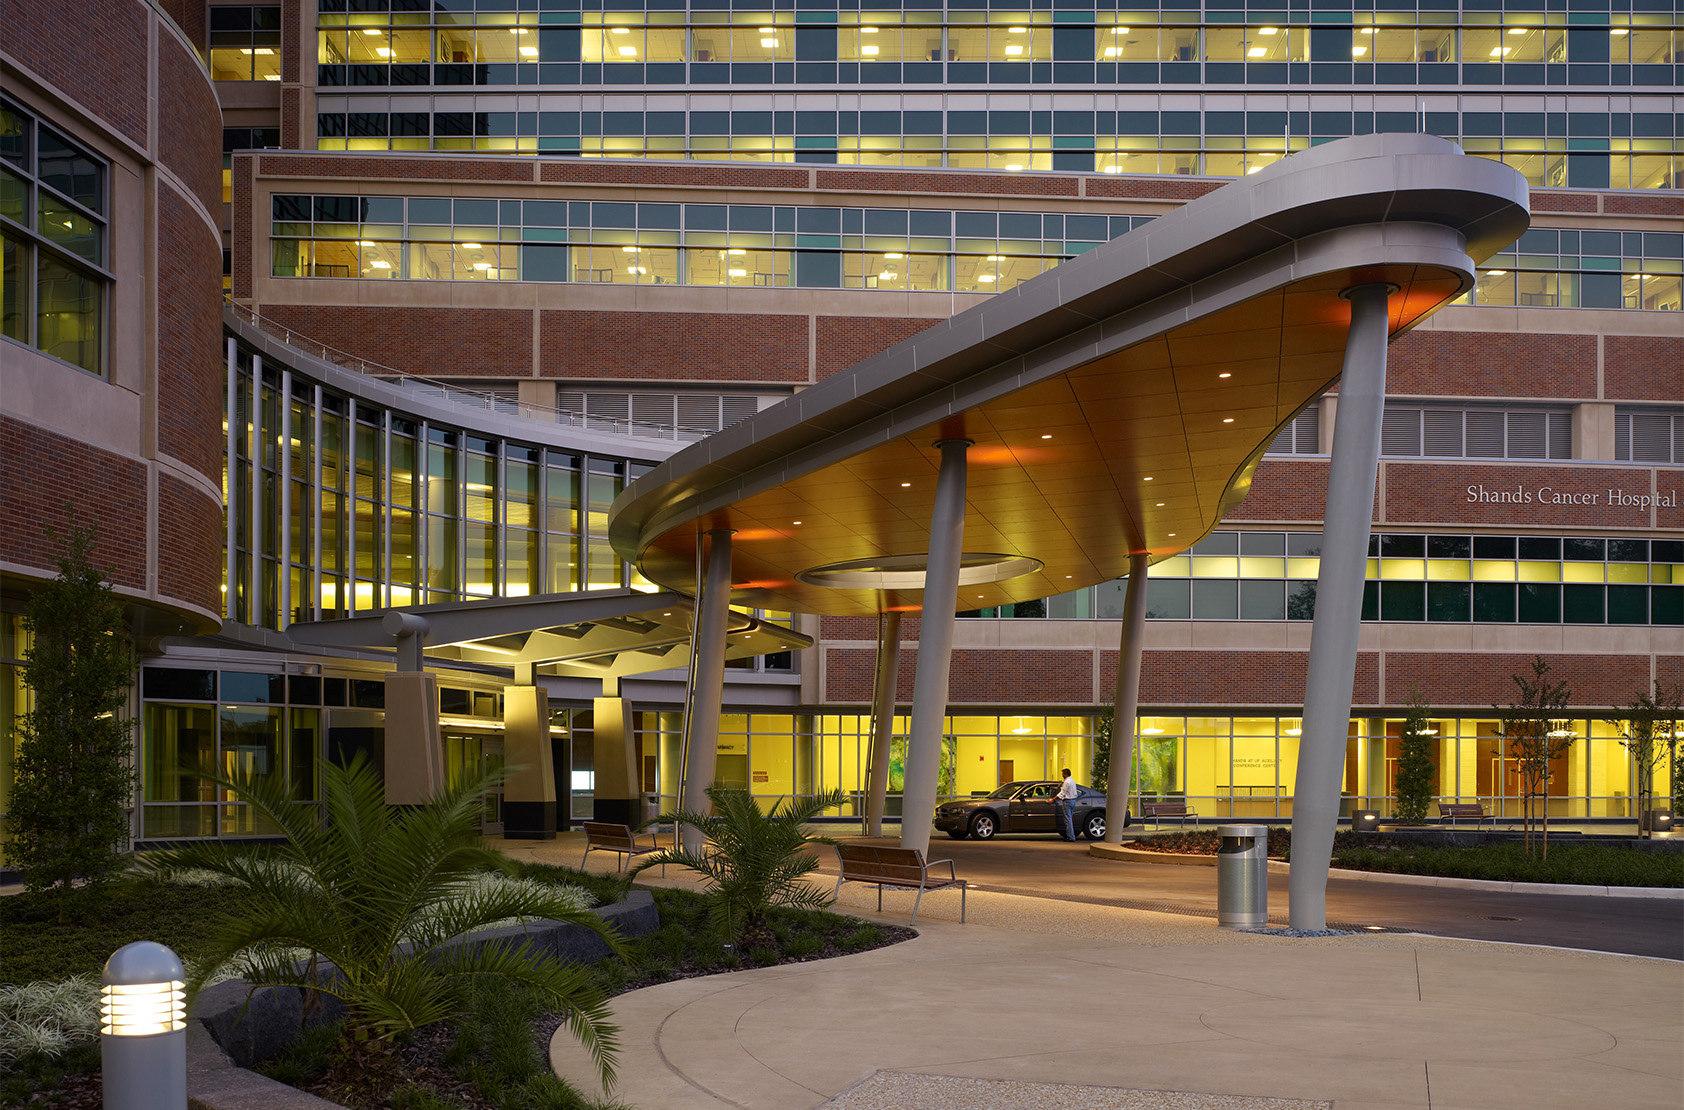 Uf Health Cancer Hospital Flad Architects